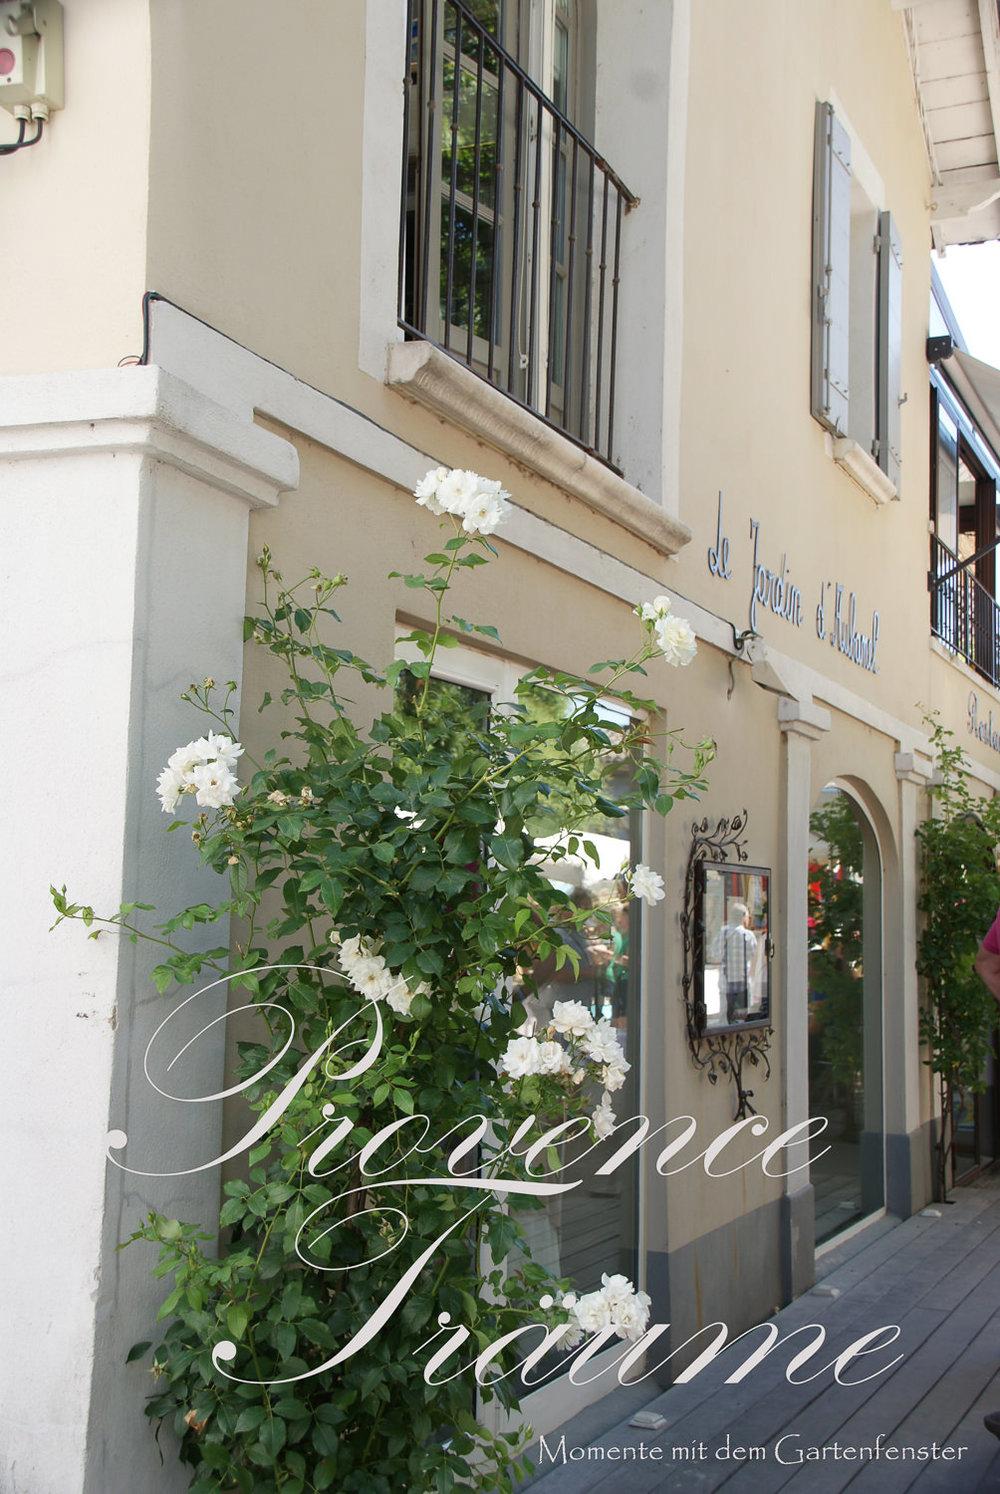 063_Lavendel Provence Gartenfenster.jpg